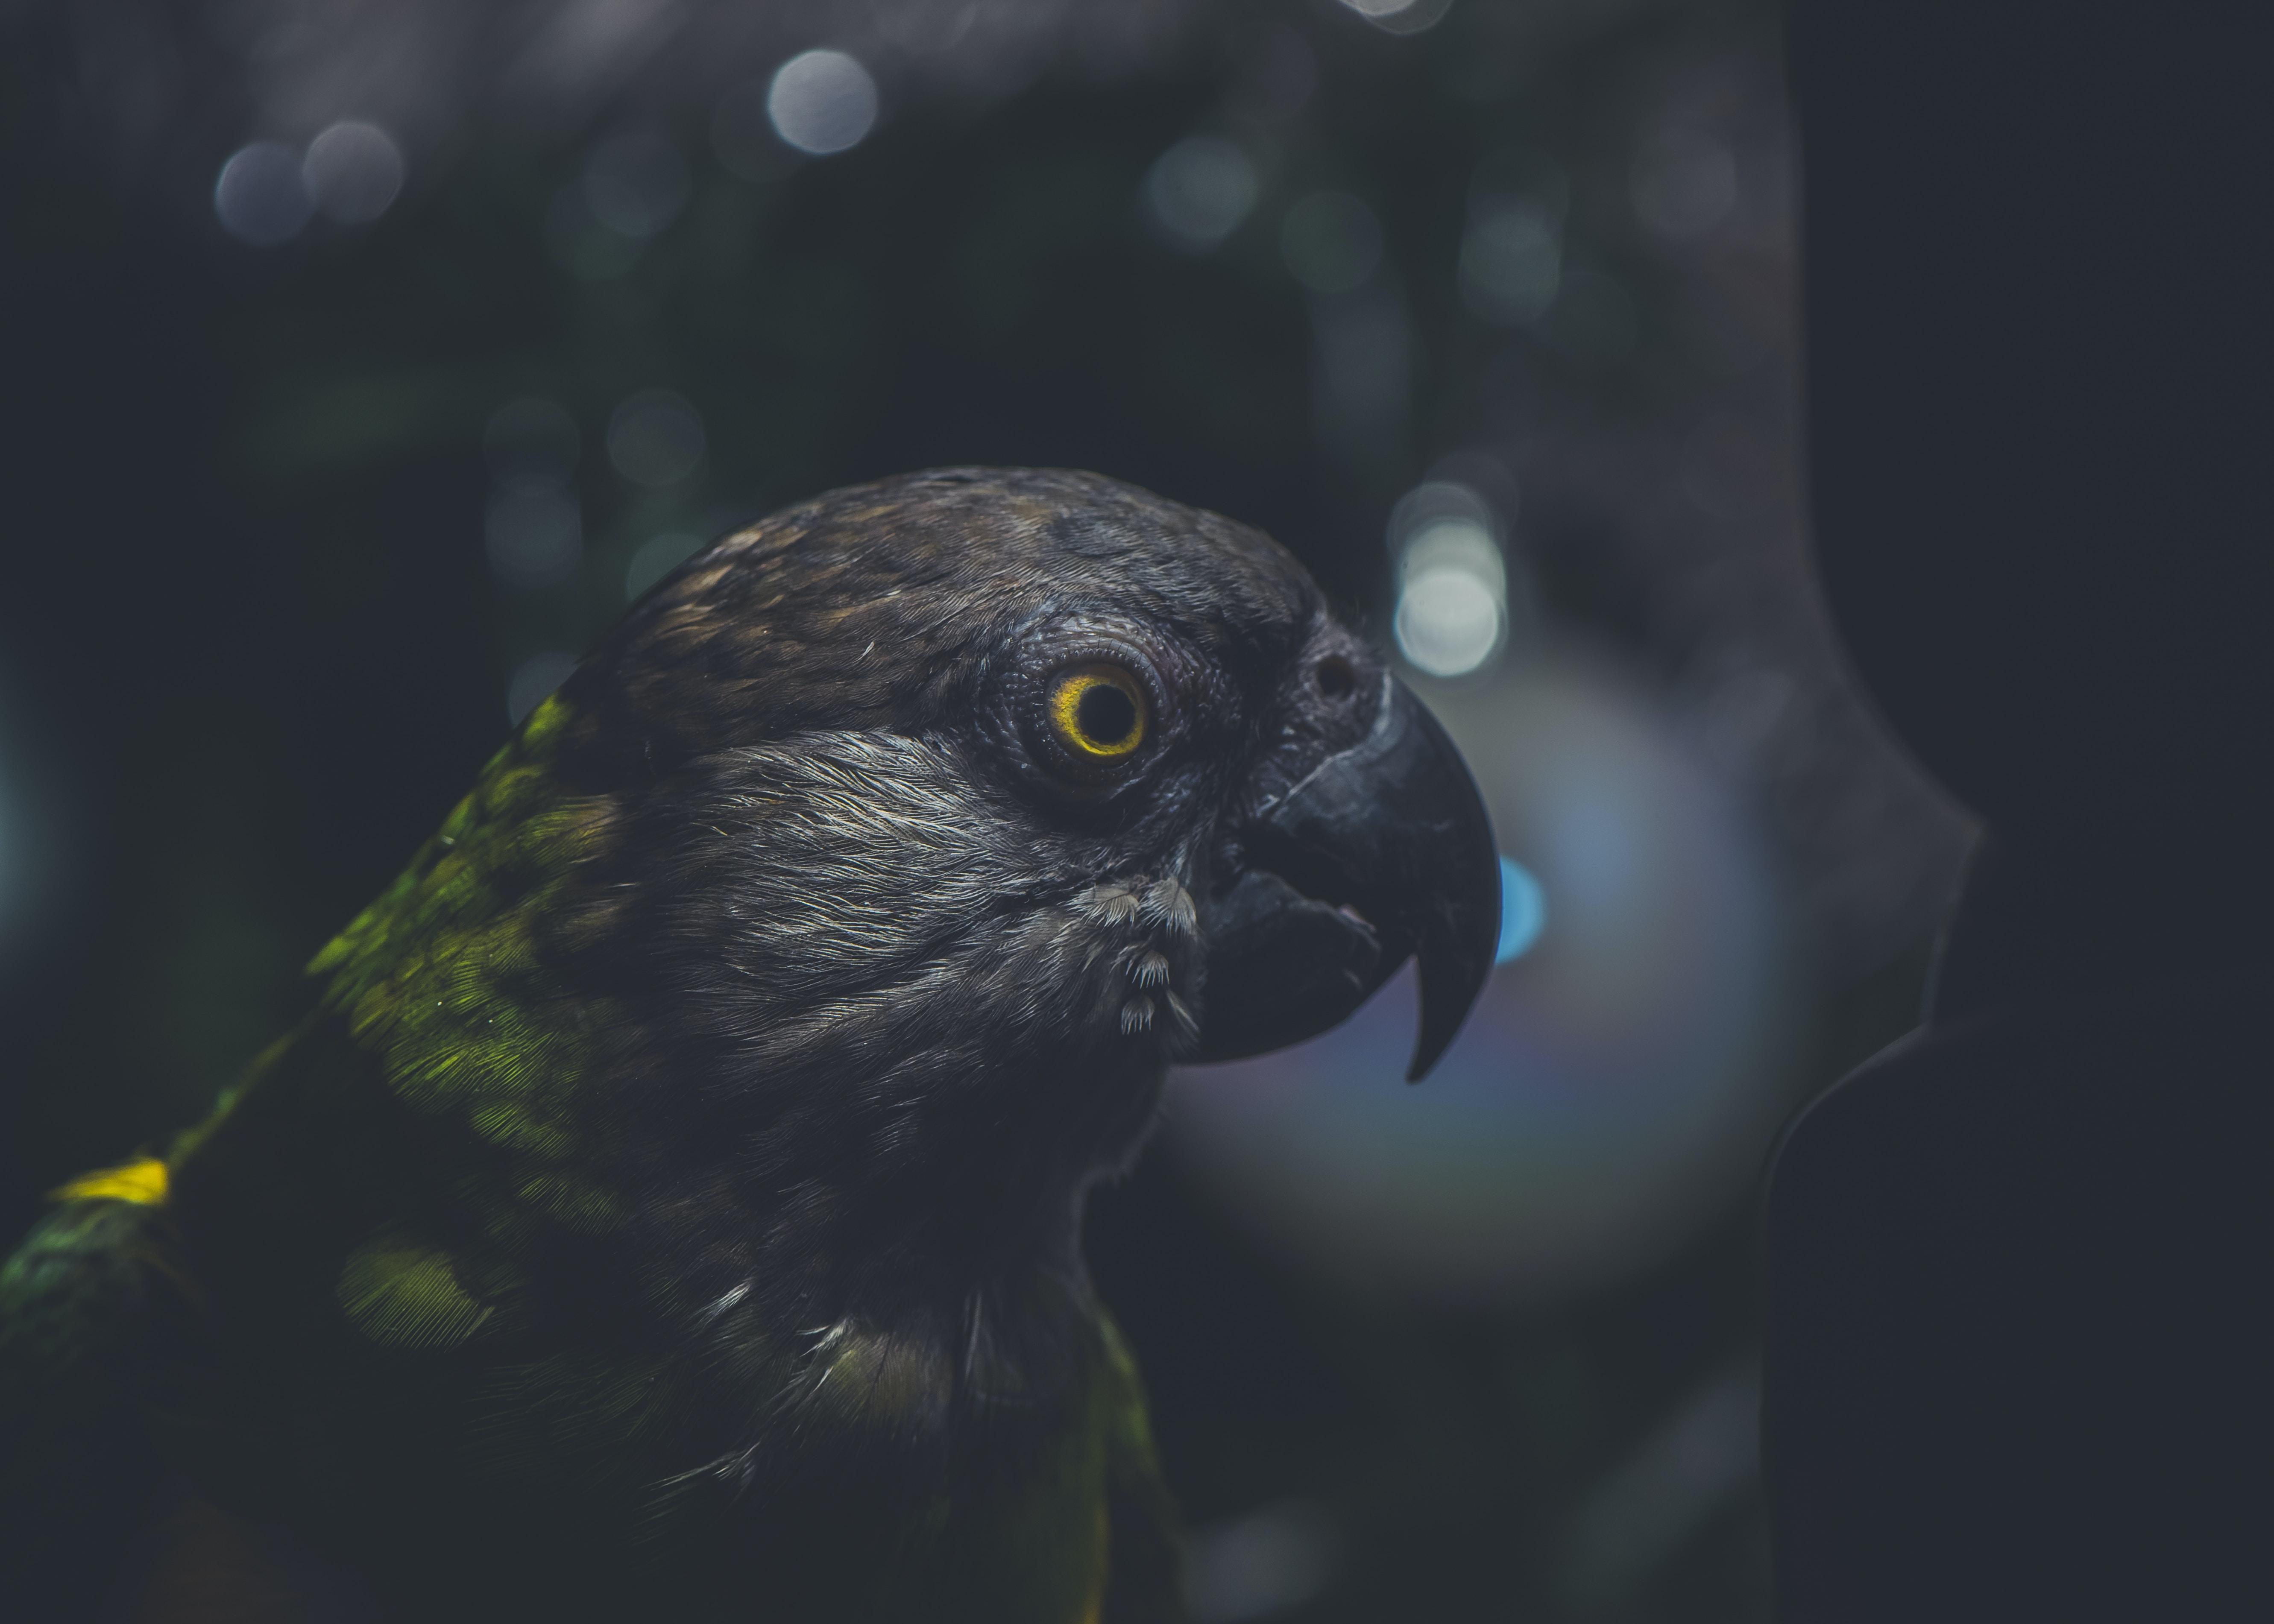 bokeh photography of green and gray bird